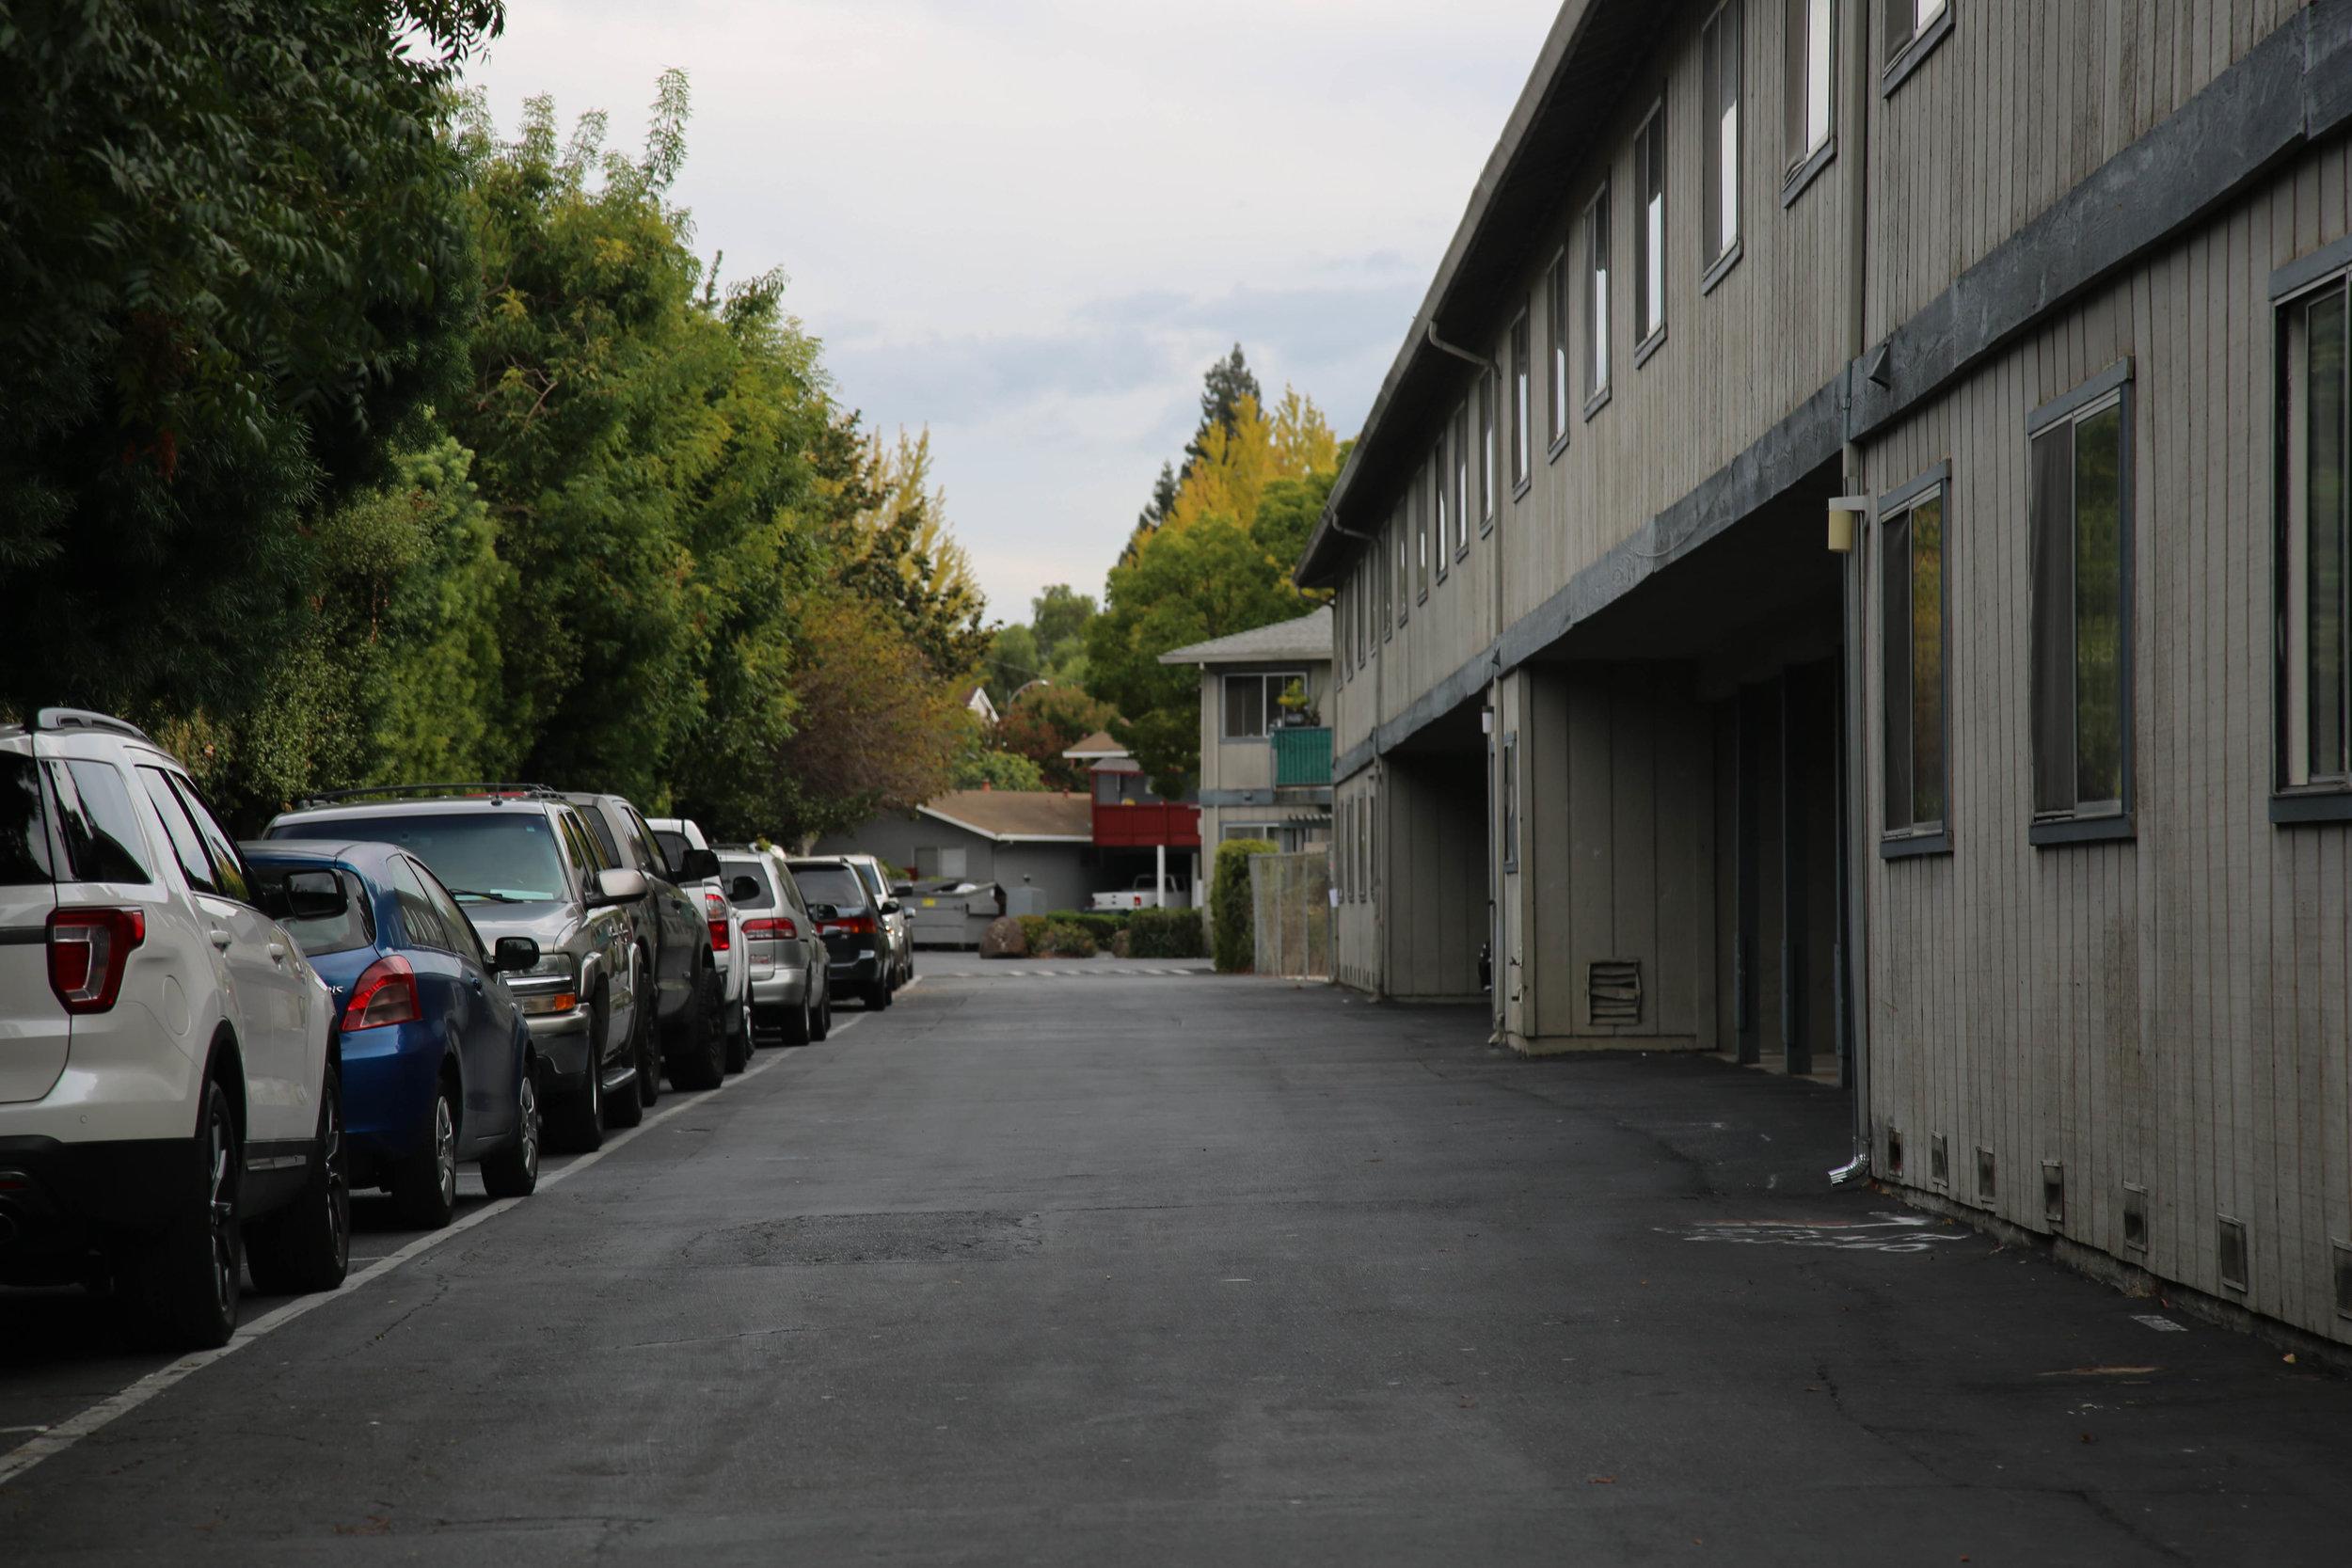 Residences at 2005 Rock Street, Mountain View, California, on Sunday, Sept. 30, 2018. (Melanie Hogue/Peninsula Press)